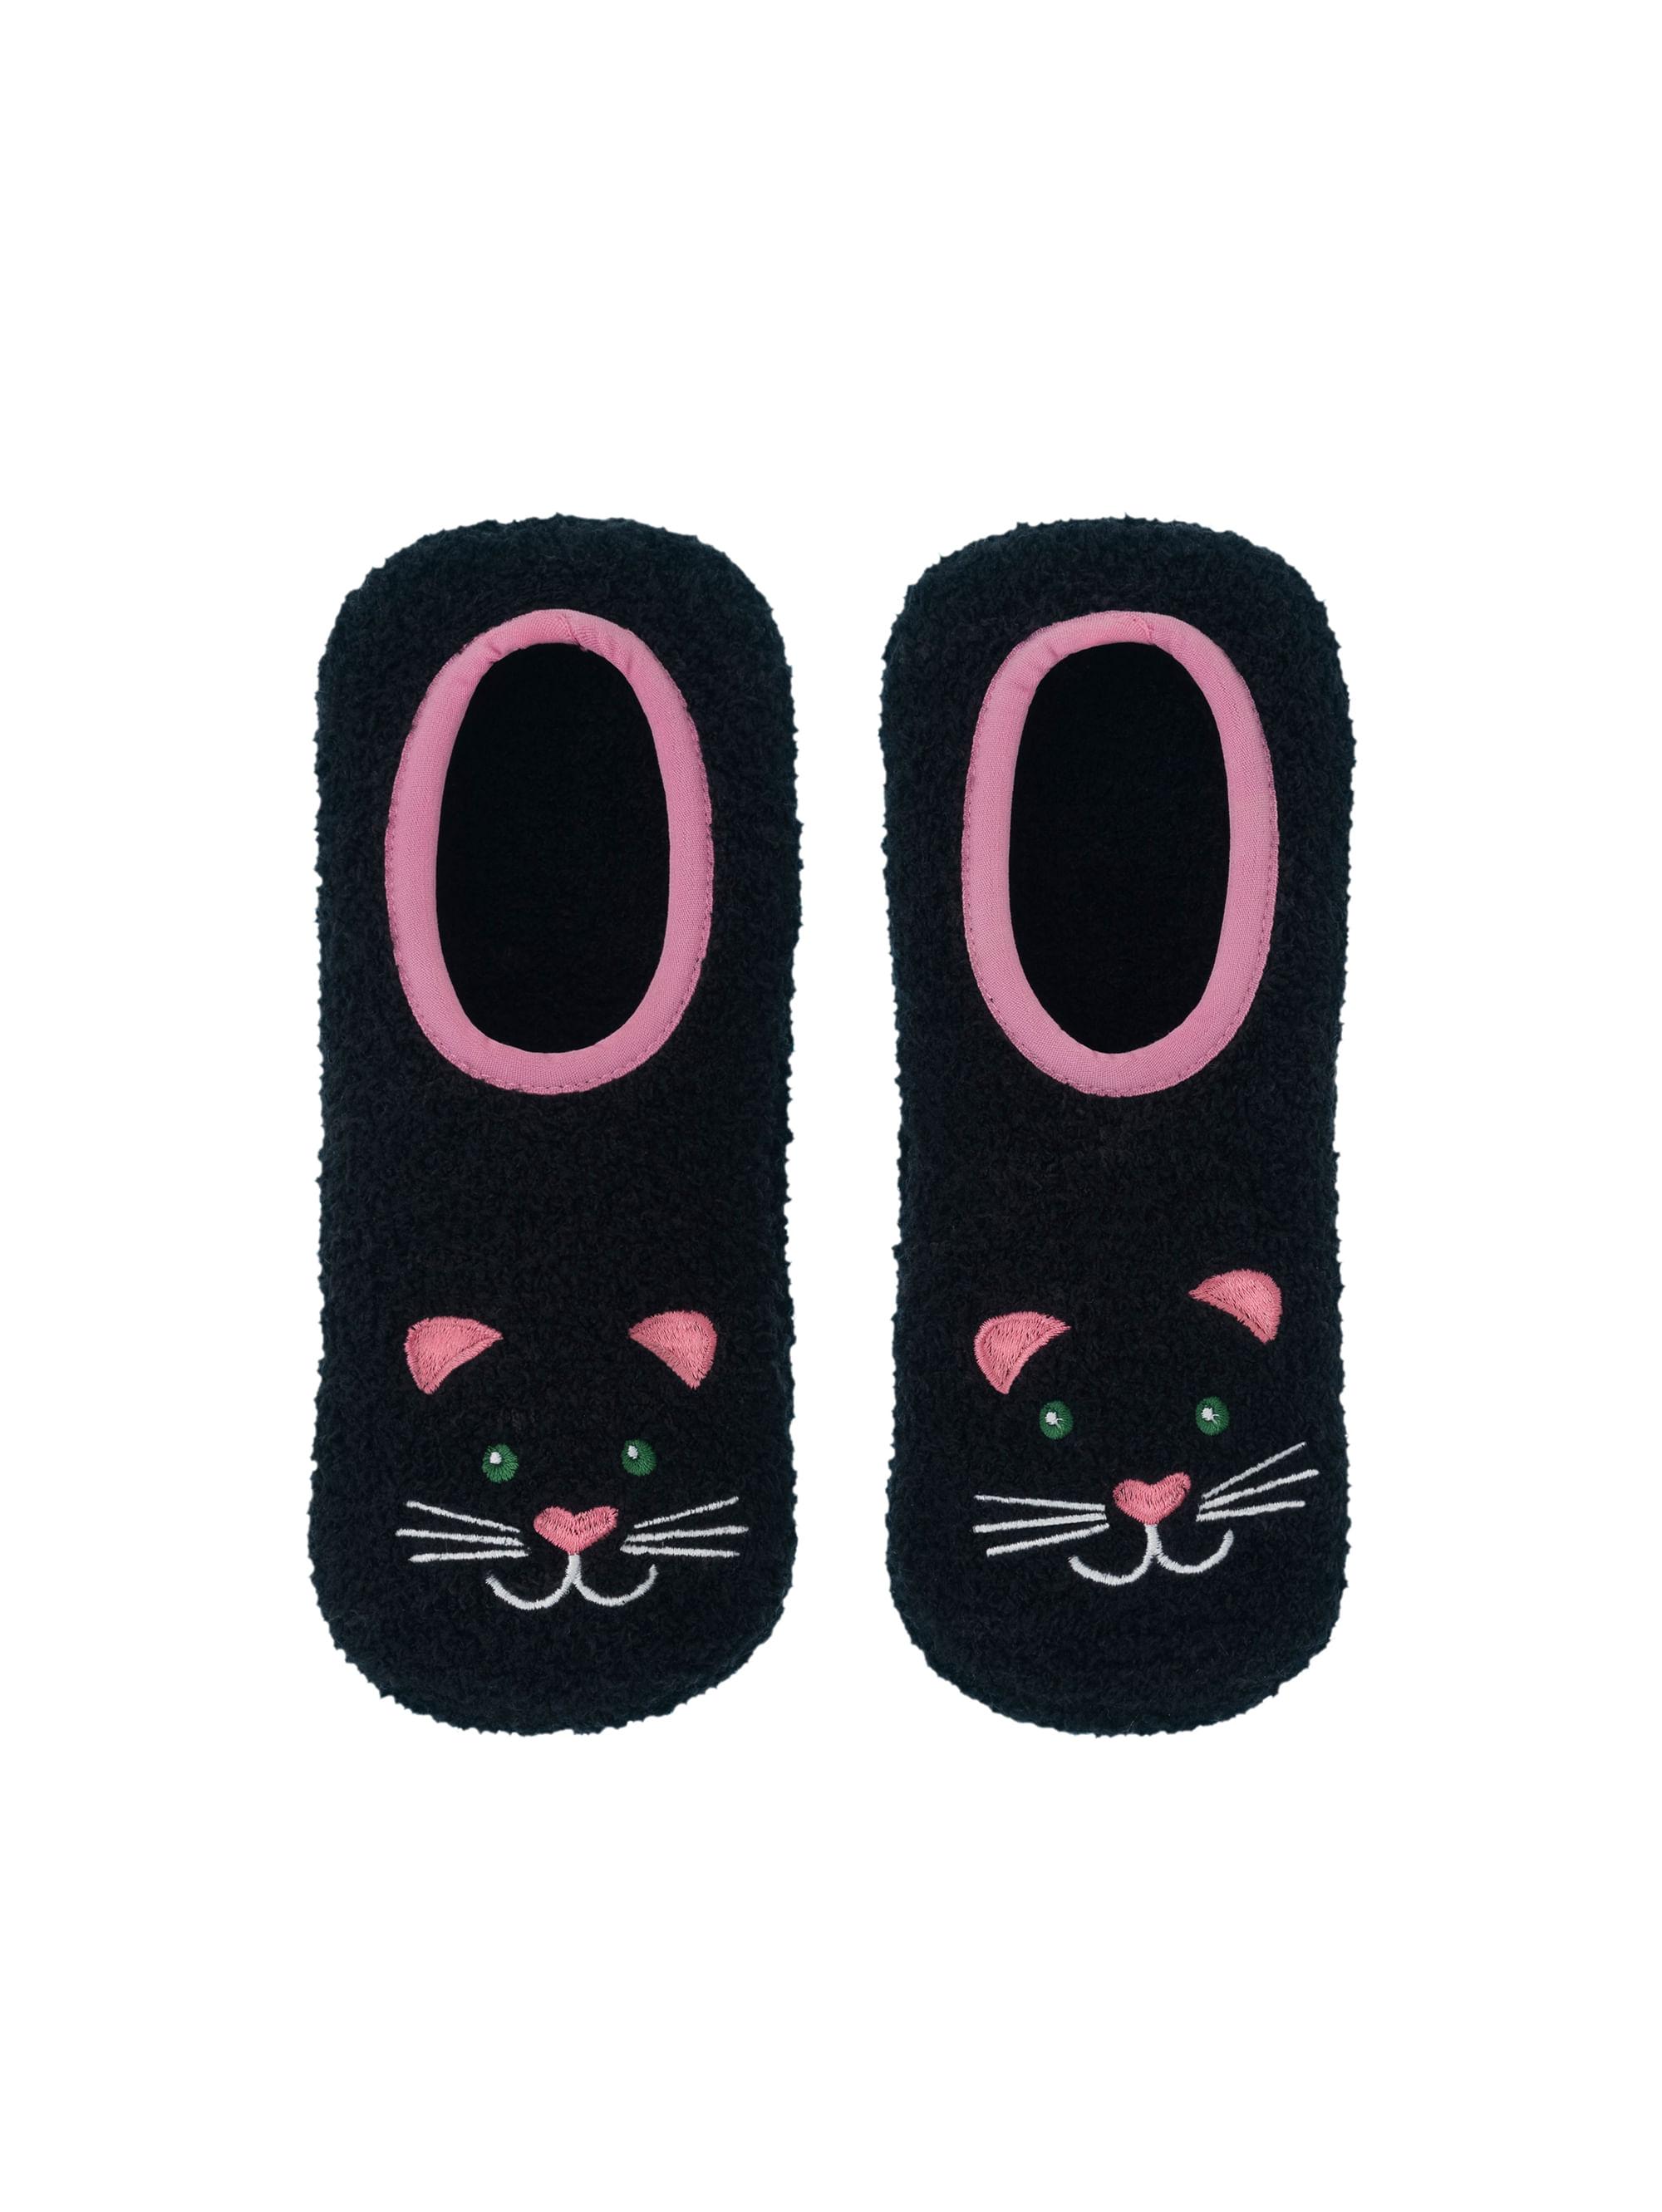 MEIA-A-CAT-BLACK-ANY-ANY-164014400138